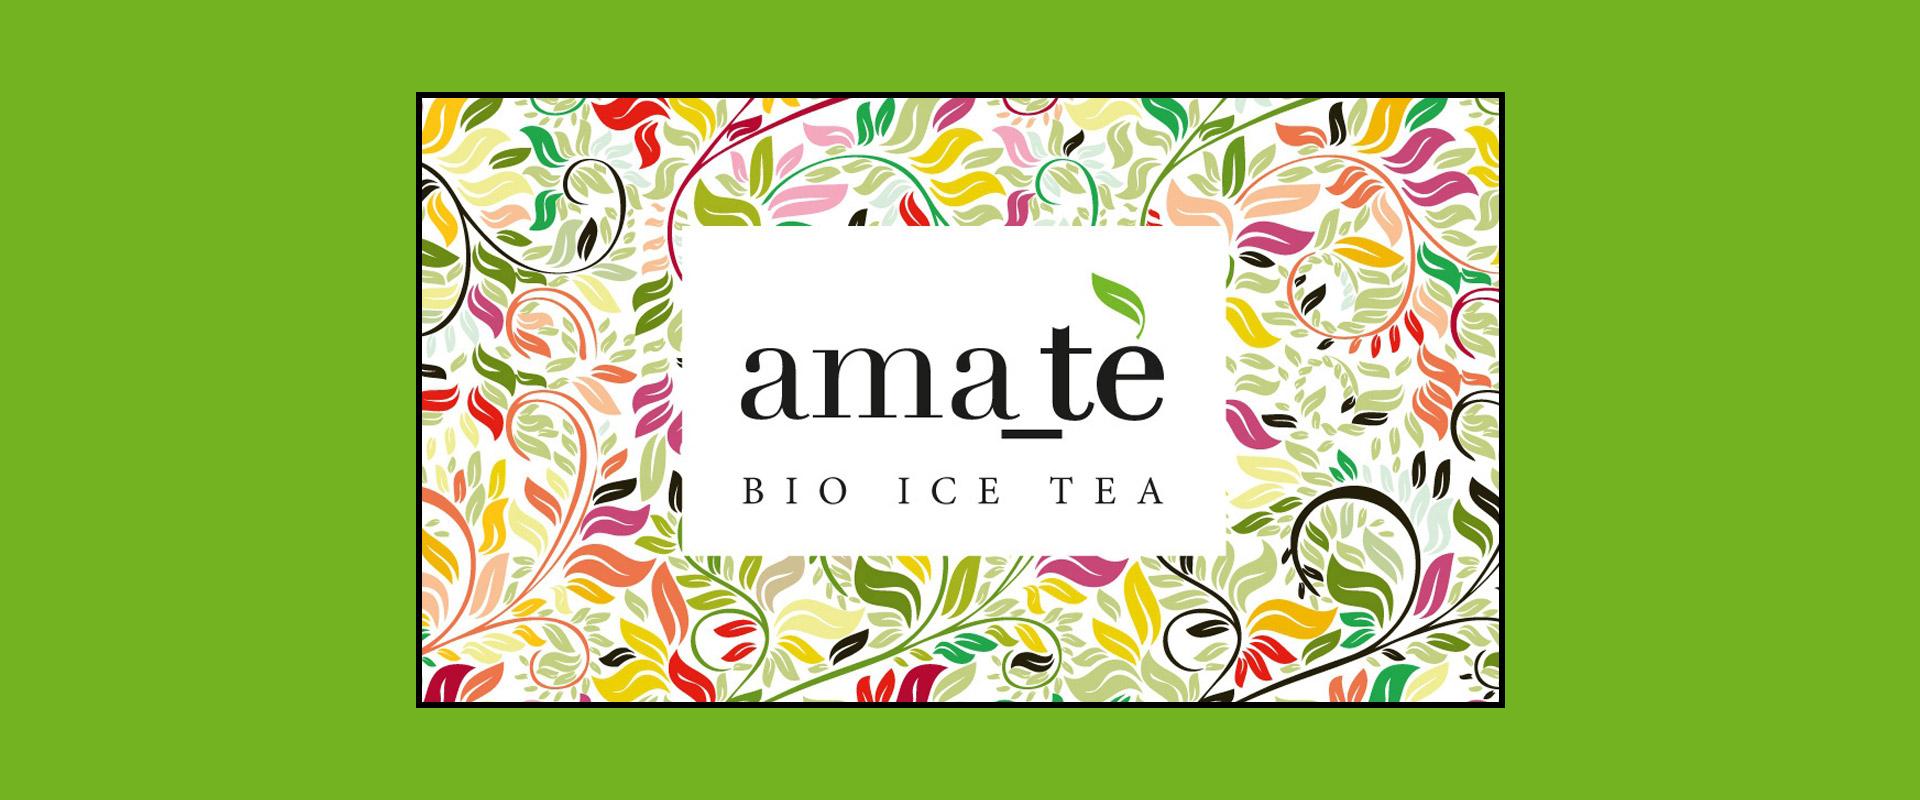 ama_tè Green Tea: il tè per chi si ama